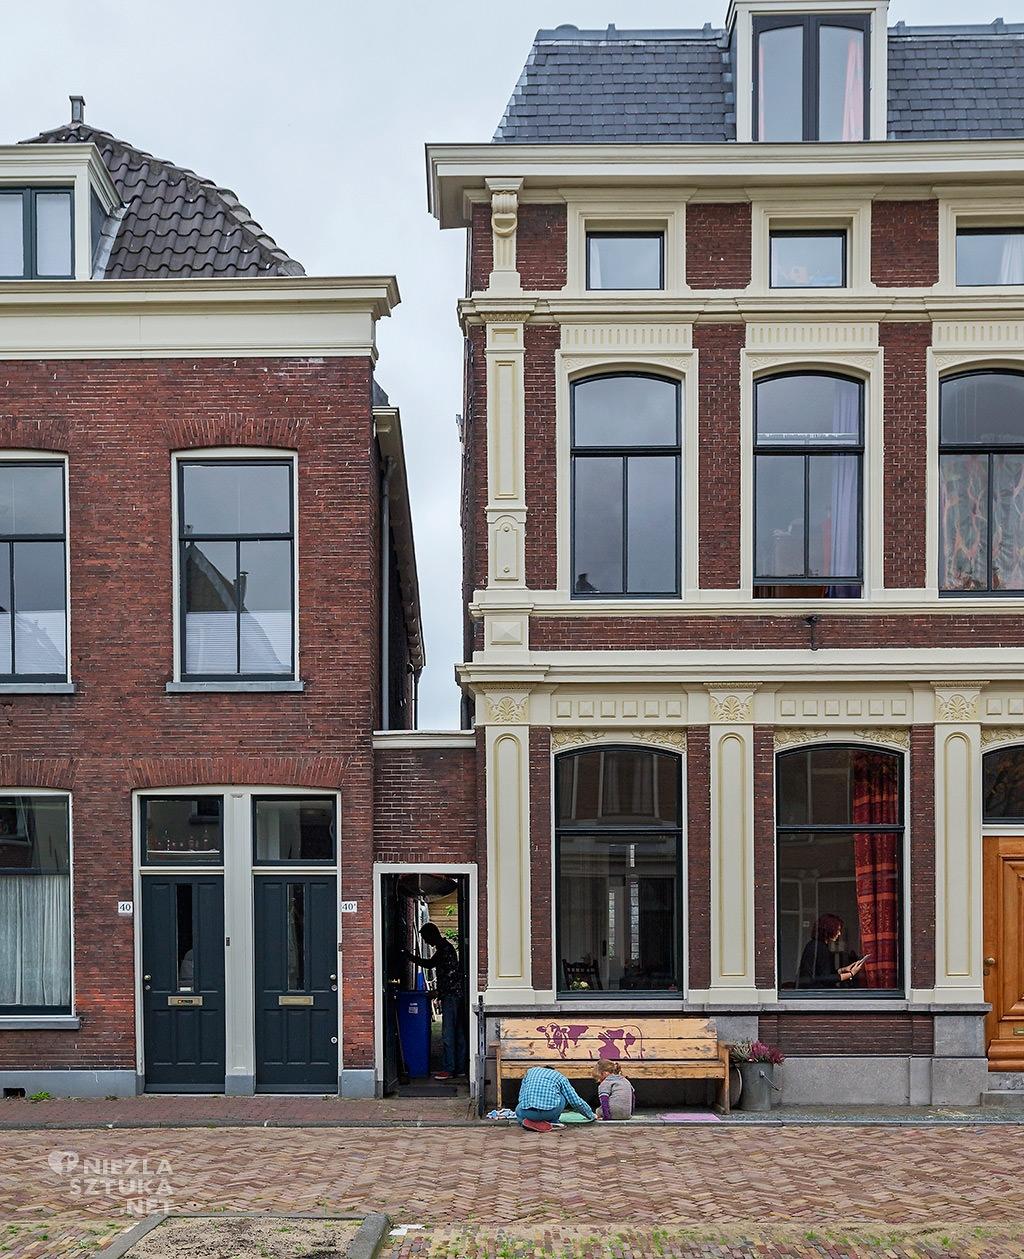 johannes Vermeer uliczka, Delft, Niezła sztuka